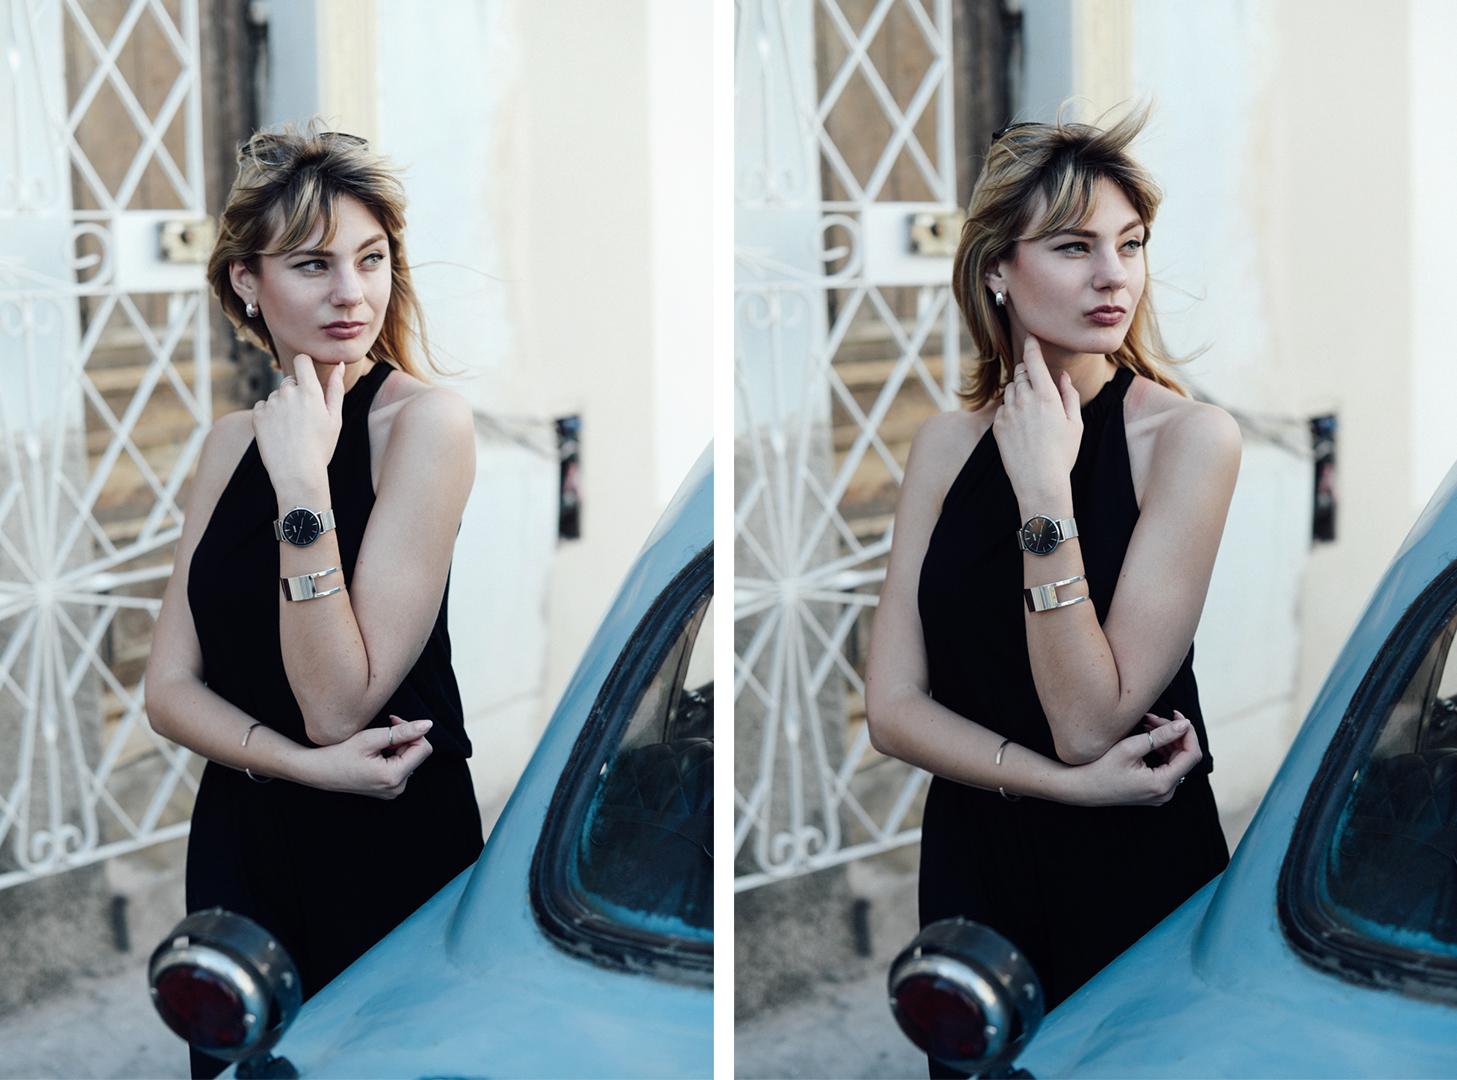 Kiamisu_Modeblog_Fashionblog_Alba Moda_Jumpsuit_Havanna_La Haban Vieja_Kuba Outfit-collage